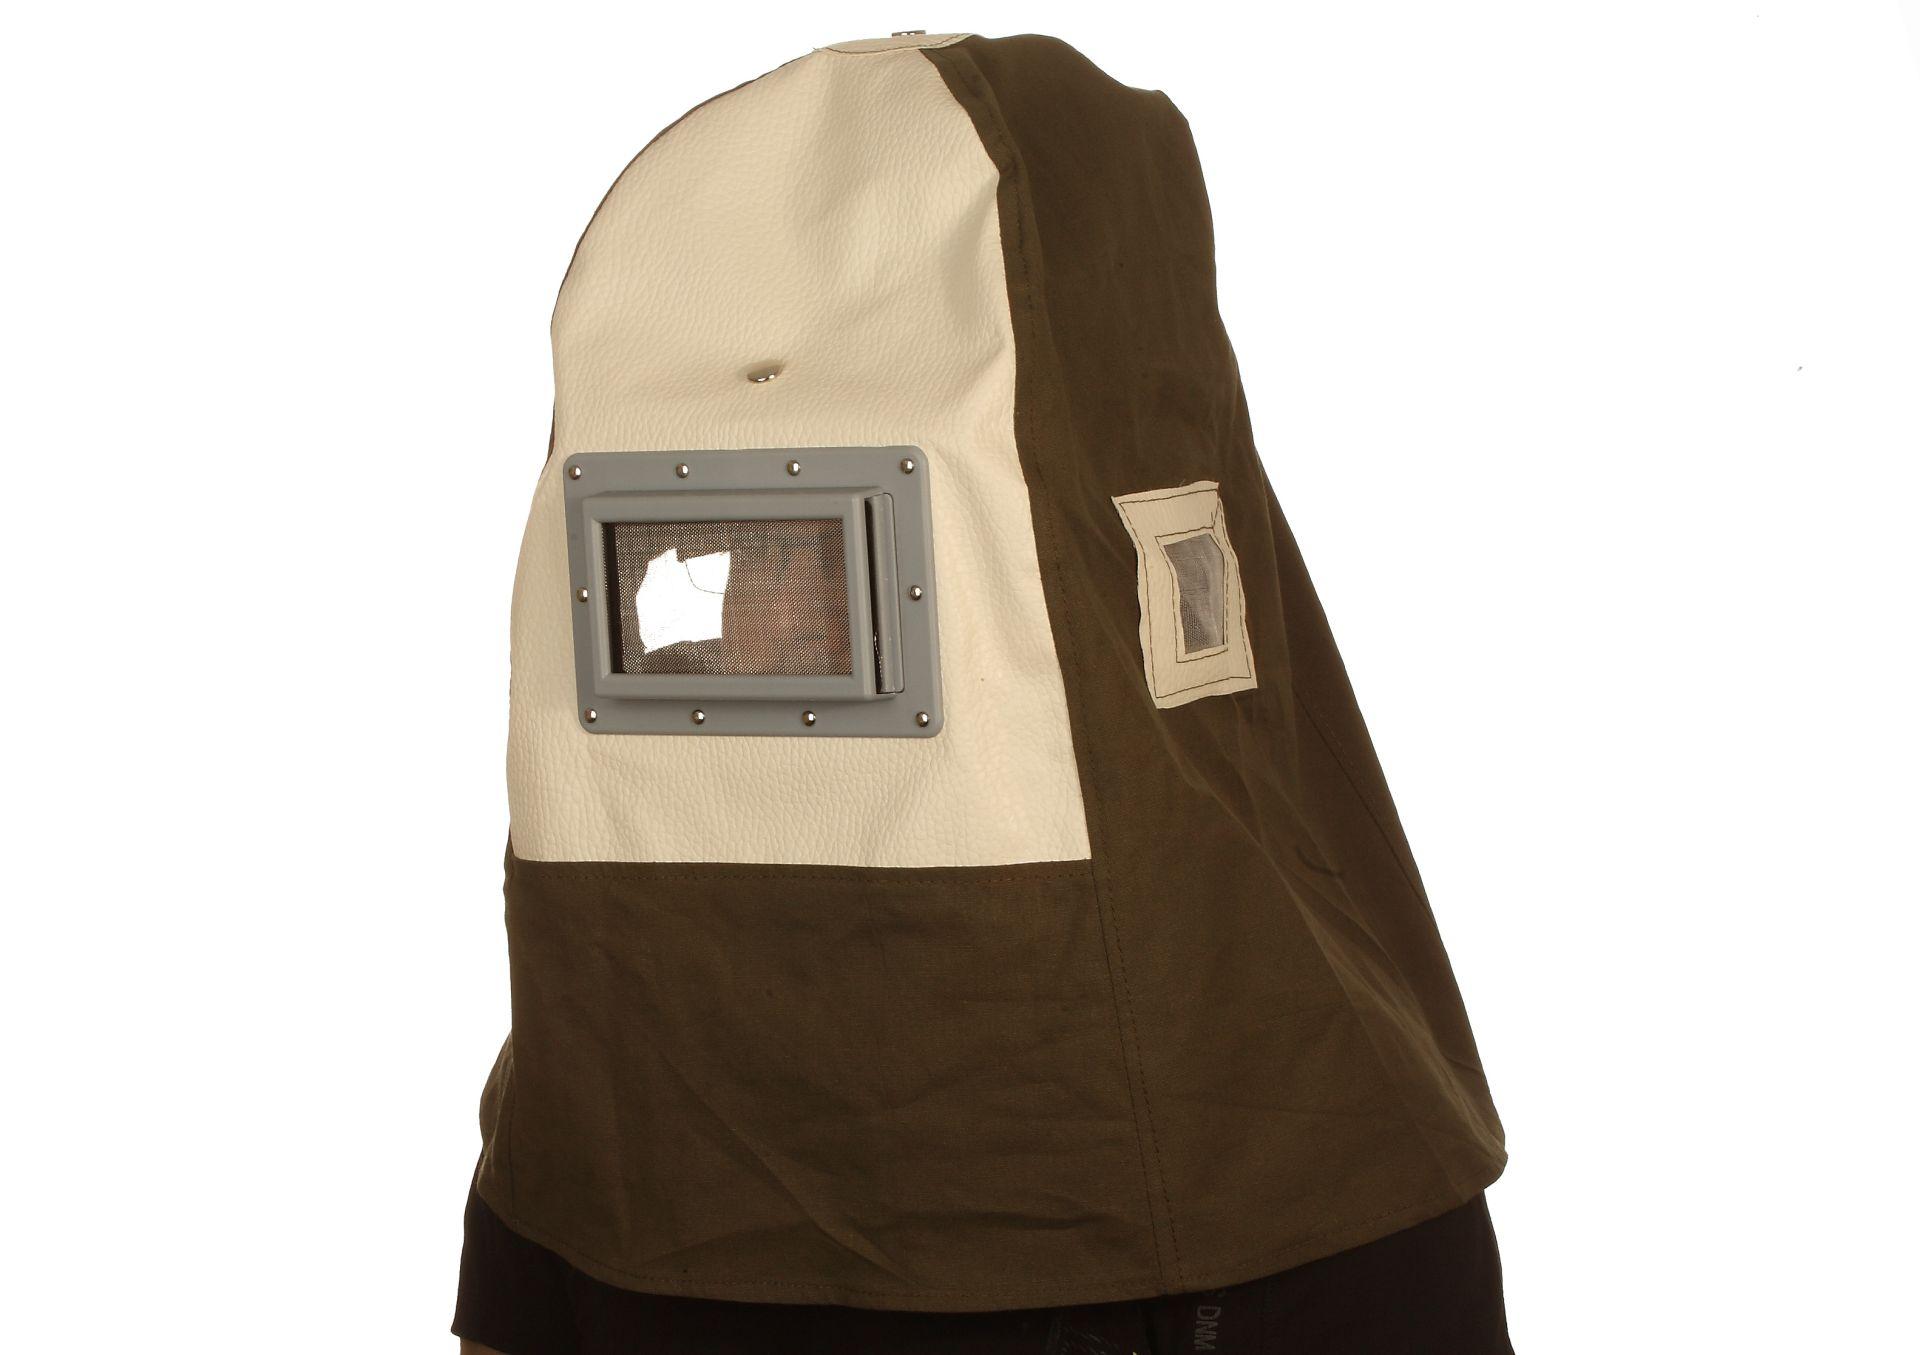 sandstrahlschutzhaube sandstrahlhelm zum sandstrahlen. Black Bedroom Furniture Sets. Home Design Ideas